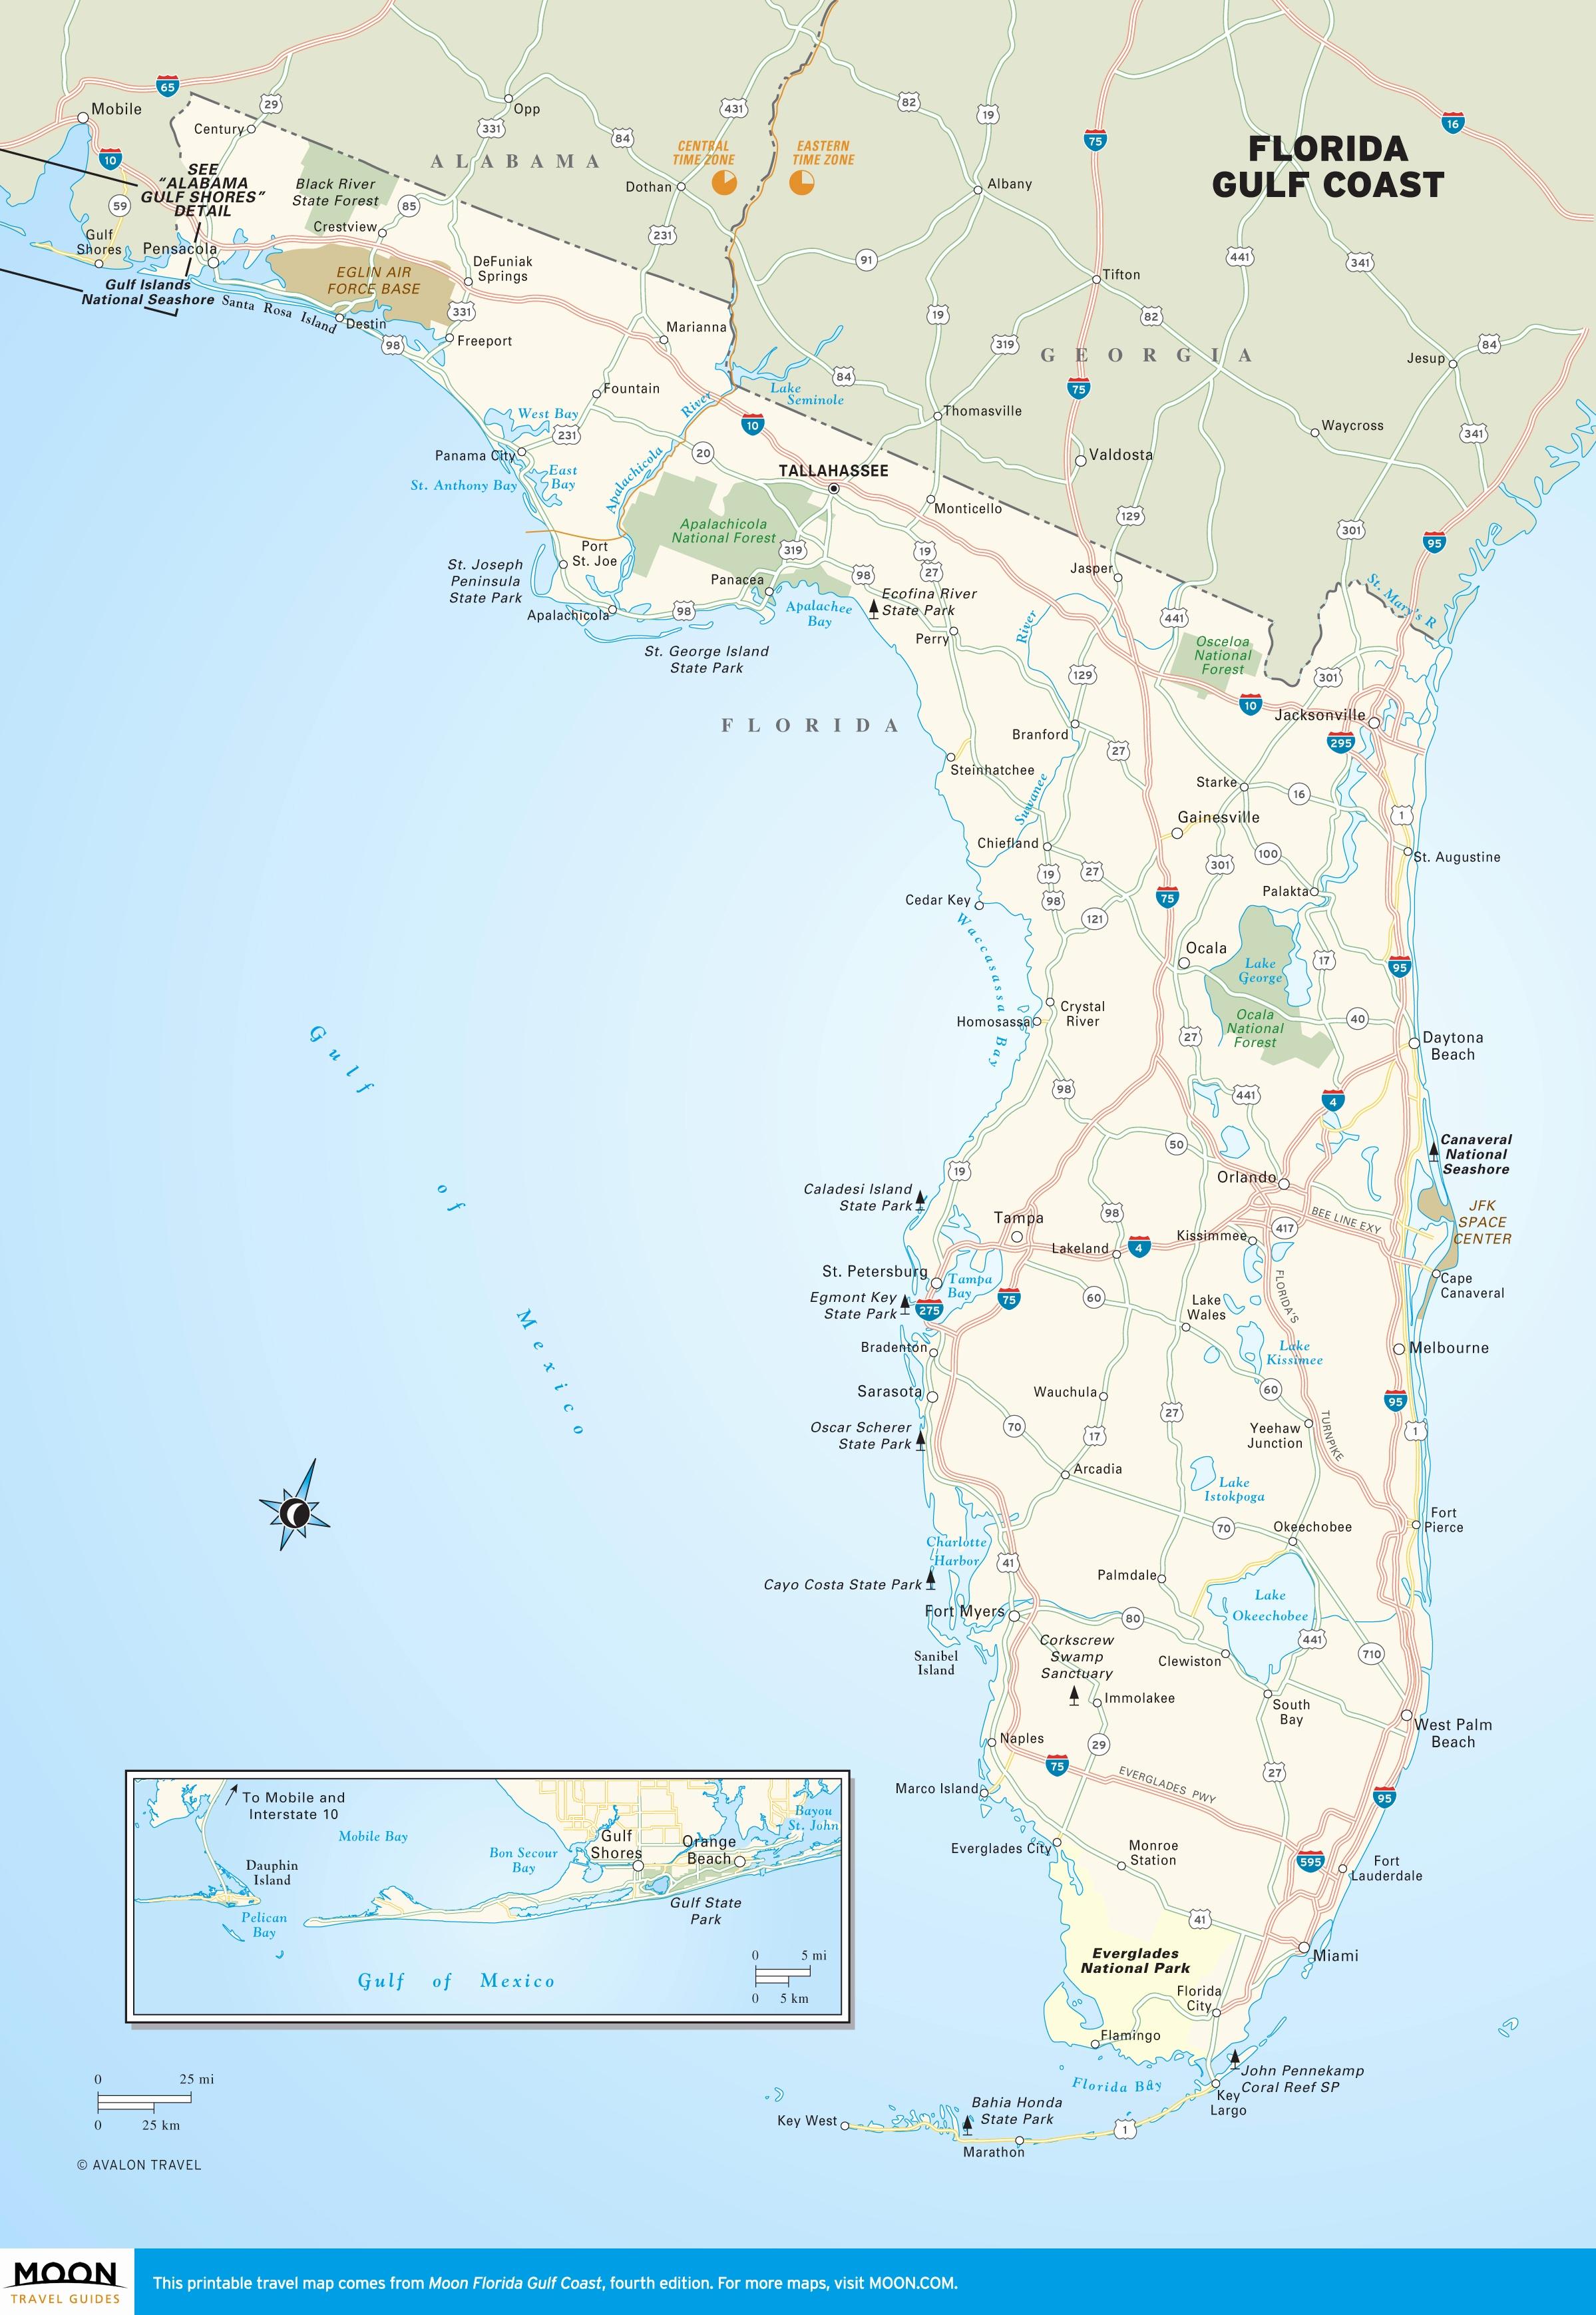 Florida Gulf Coast Beaches Map Fresh Alabama Florida Map - Map Of Beaches On The Gulf Side Of Florida